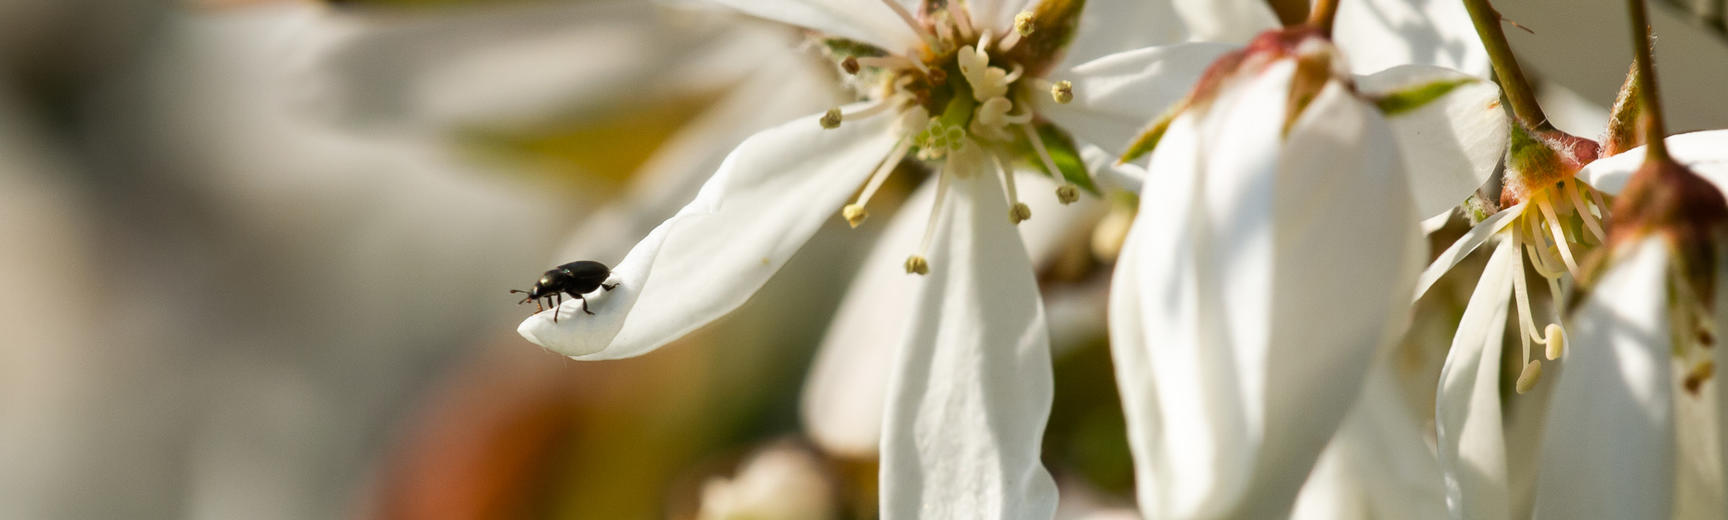 rosaceae amelanchier oxford botanic garden p1010059